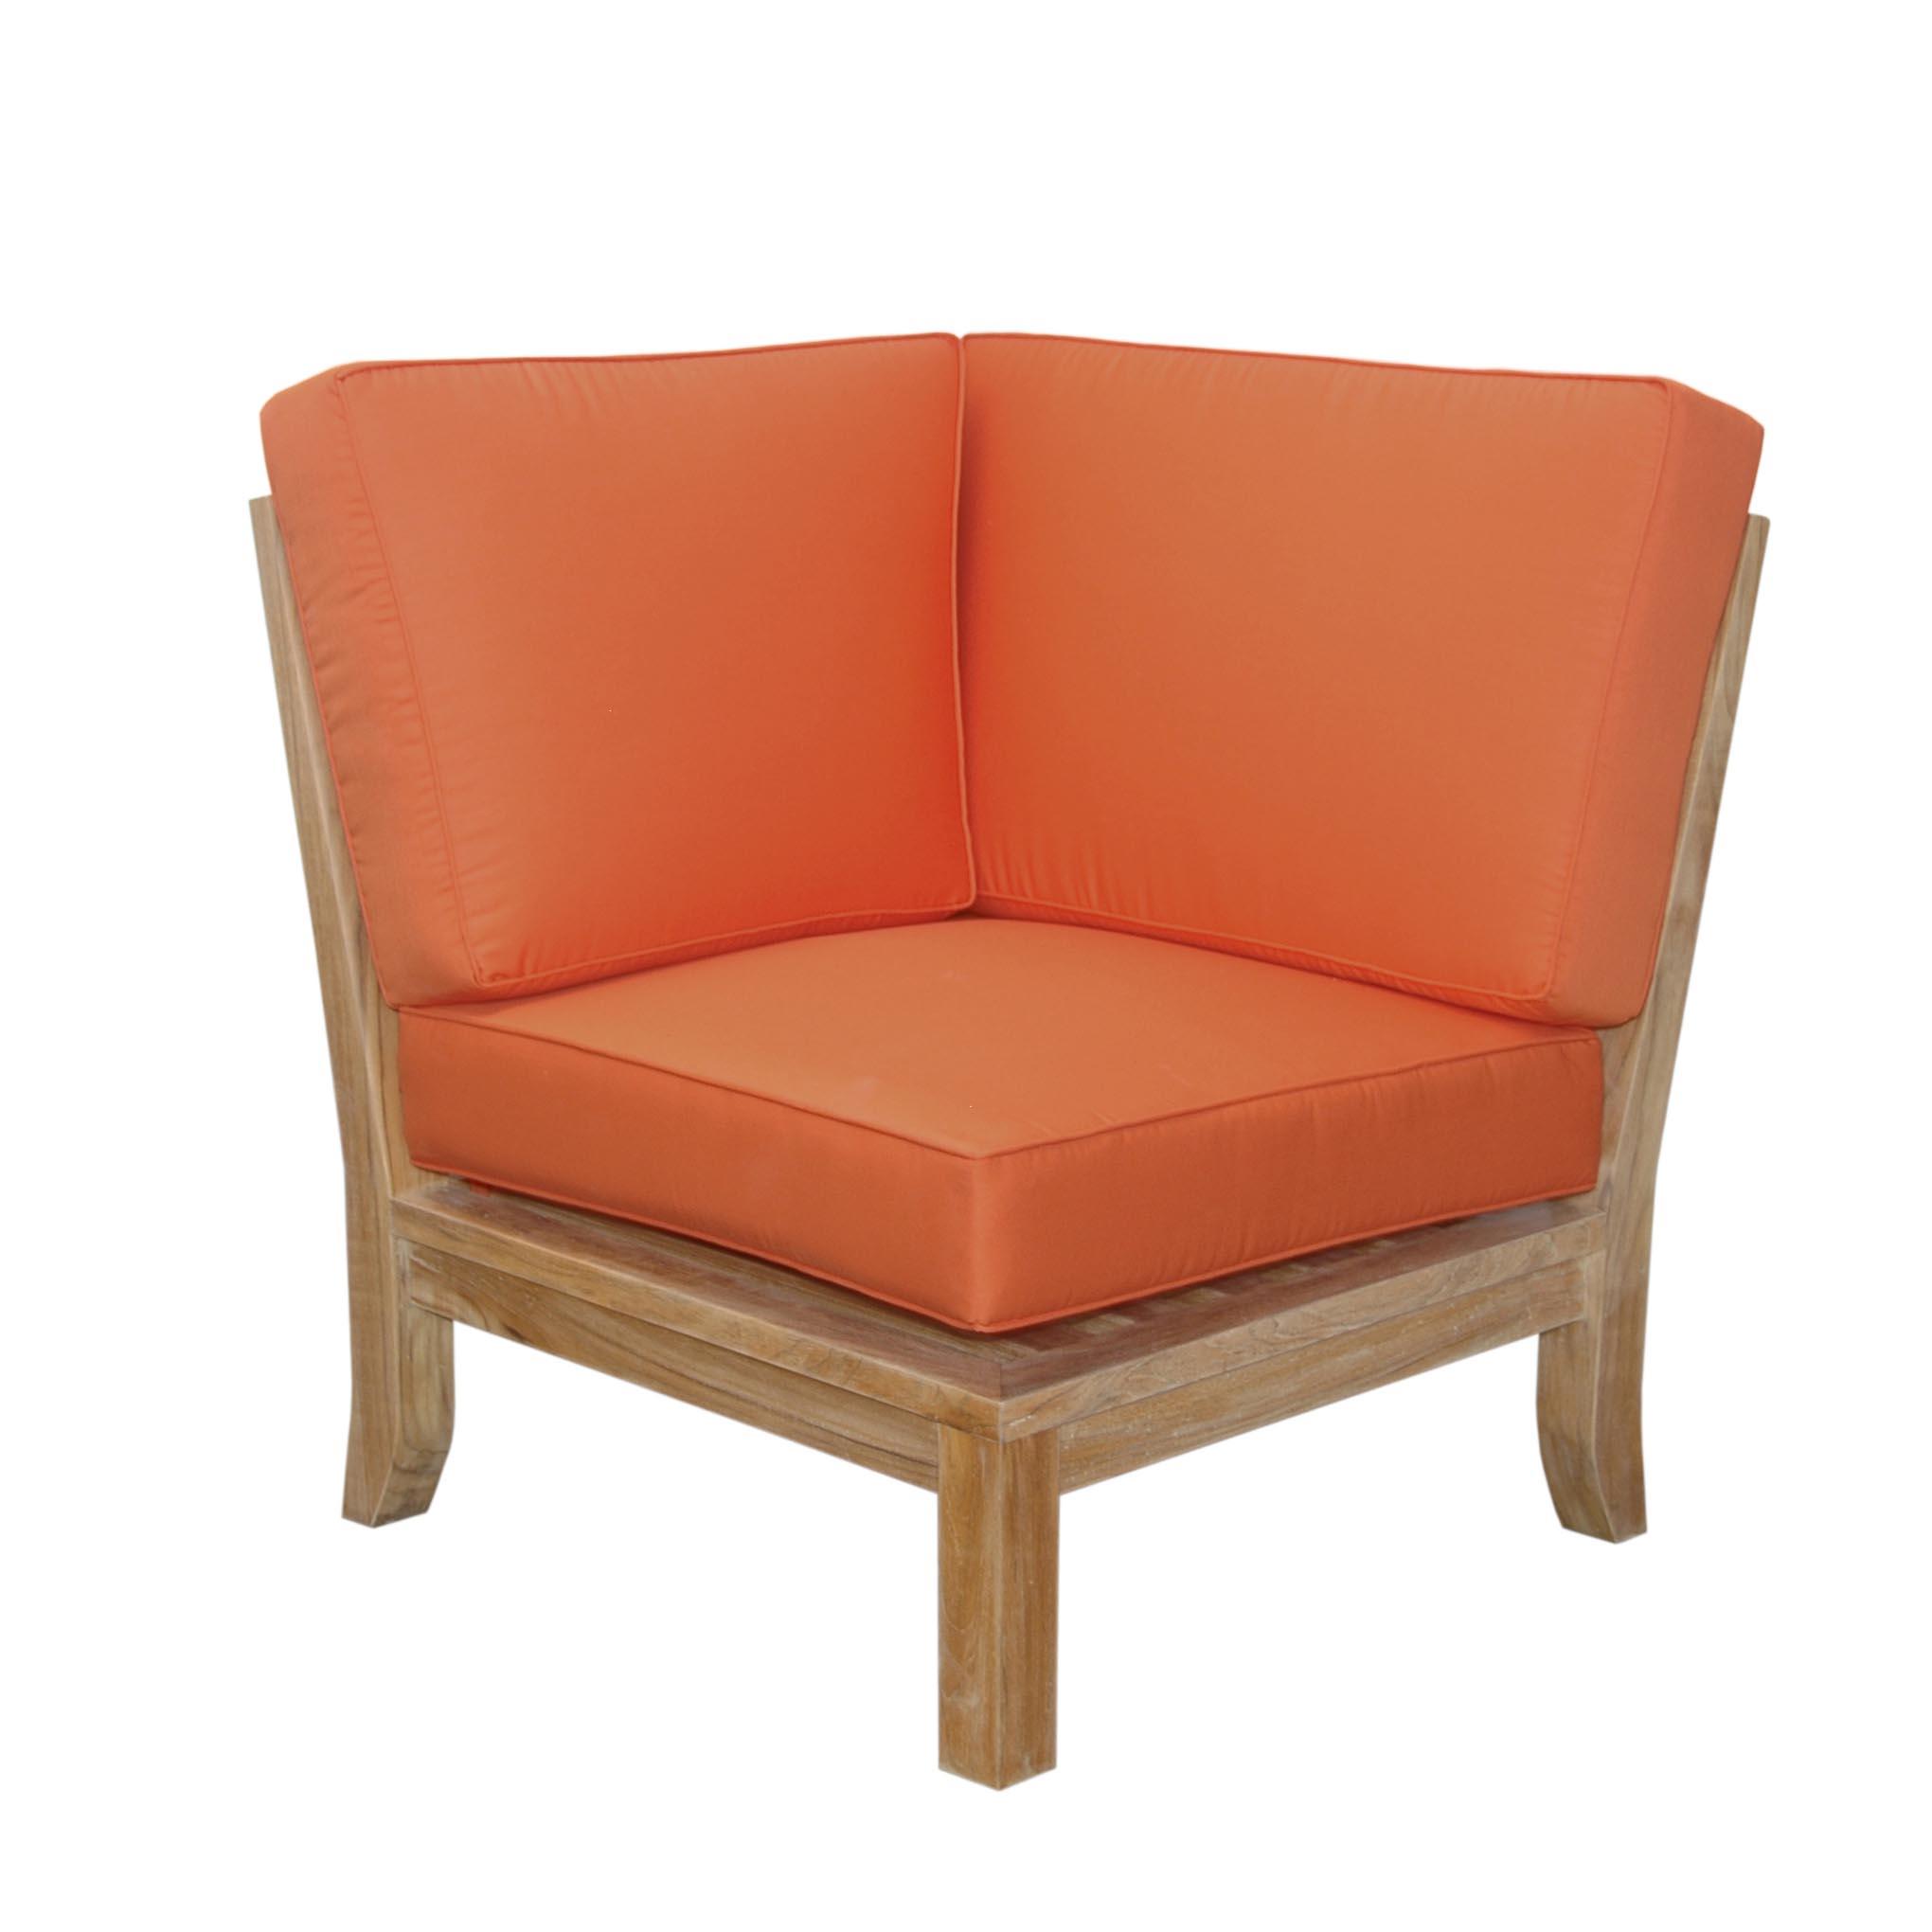 Wonderful Teak-Luxe-Corner-Modular-Sofa Product Picture 498